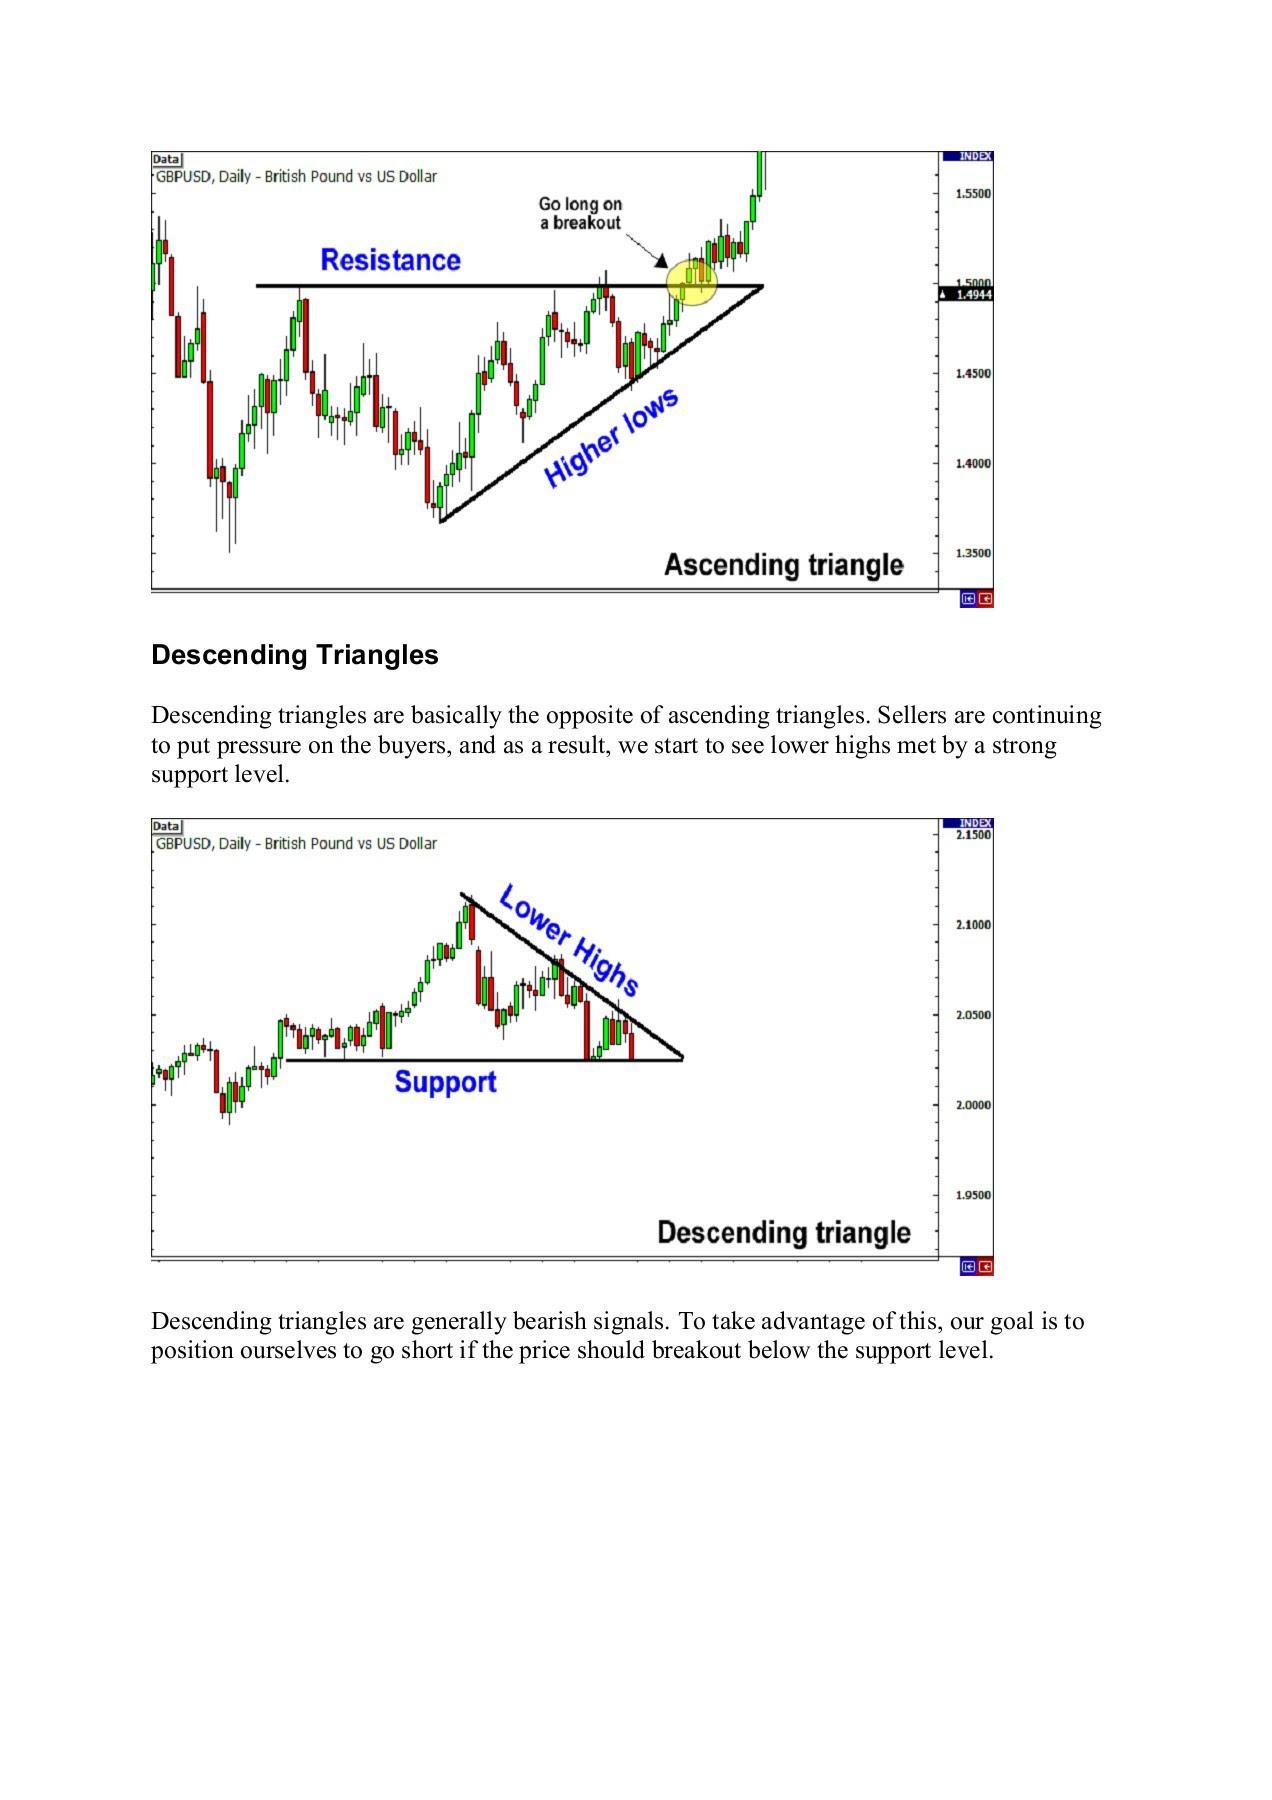 Economic calendar? - Beginner Questions - blogger.com Forex Trading Forum